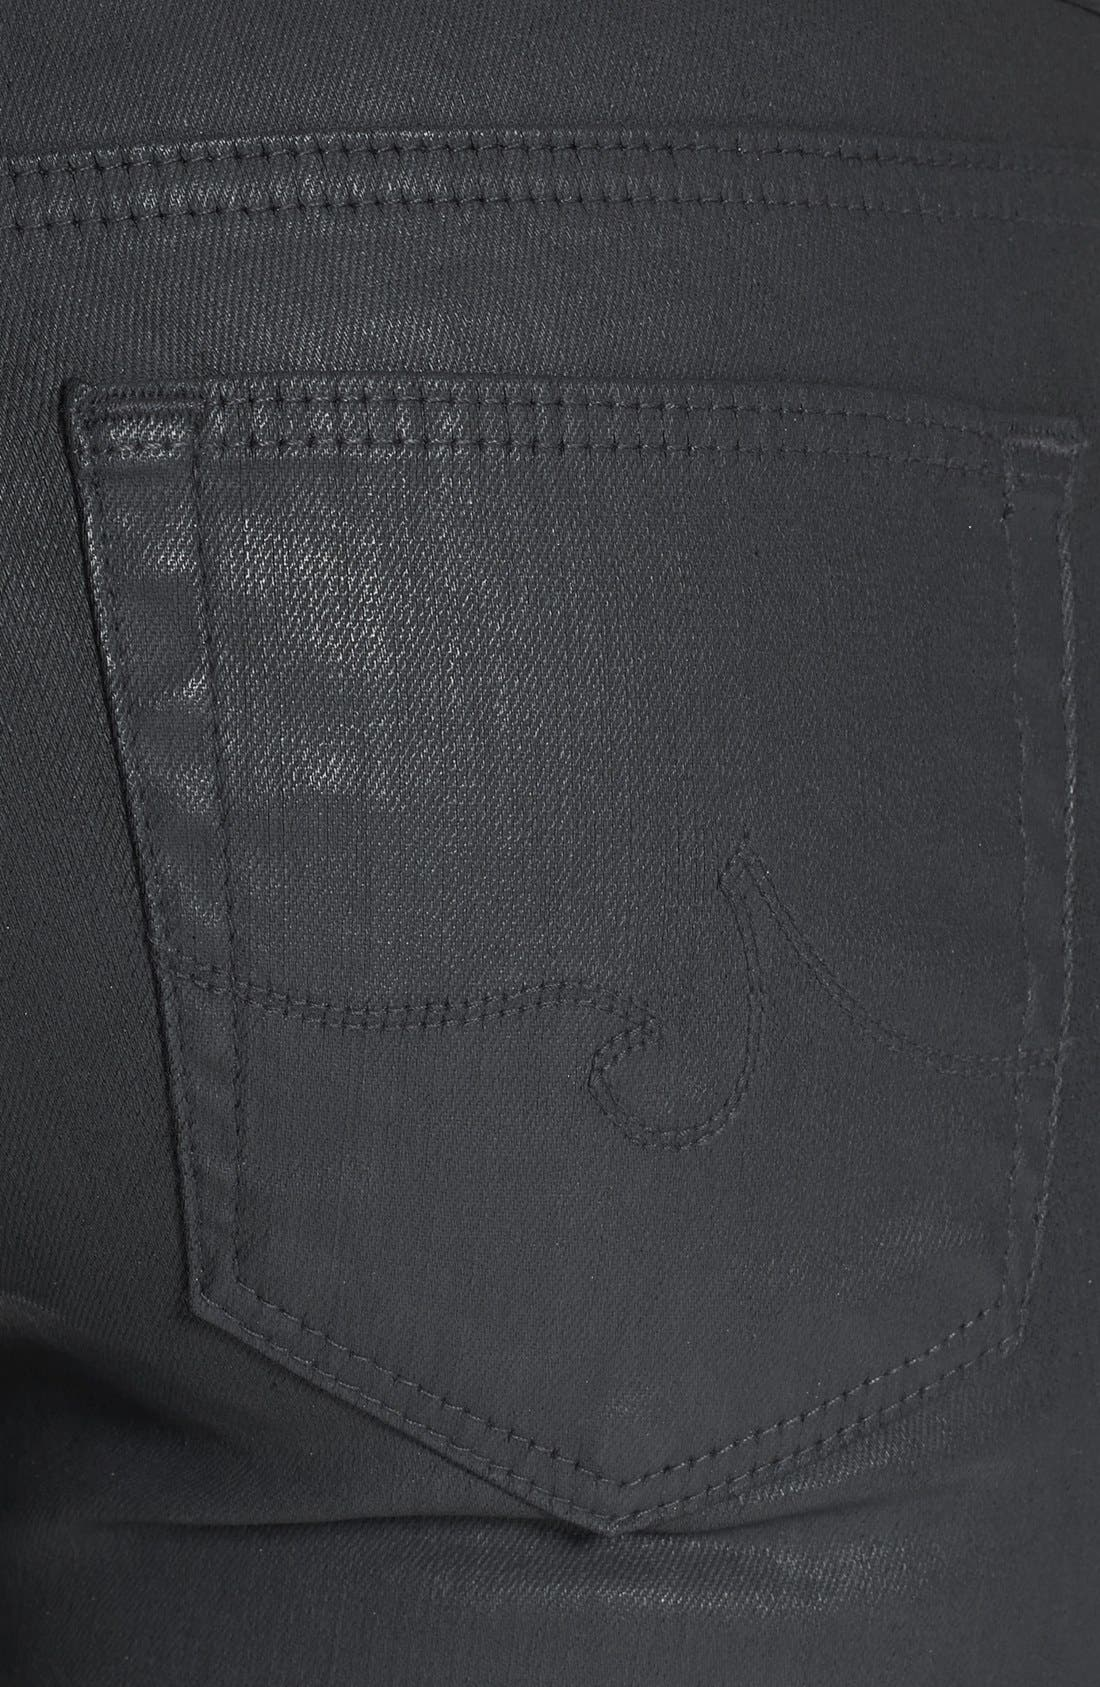 Alternate Image 3  - AG 'The Absolute Legging' Coated Skinny Jeans (Dark Grey)